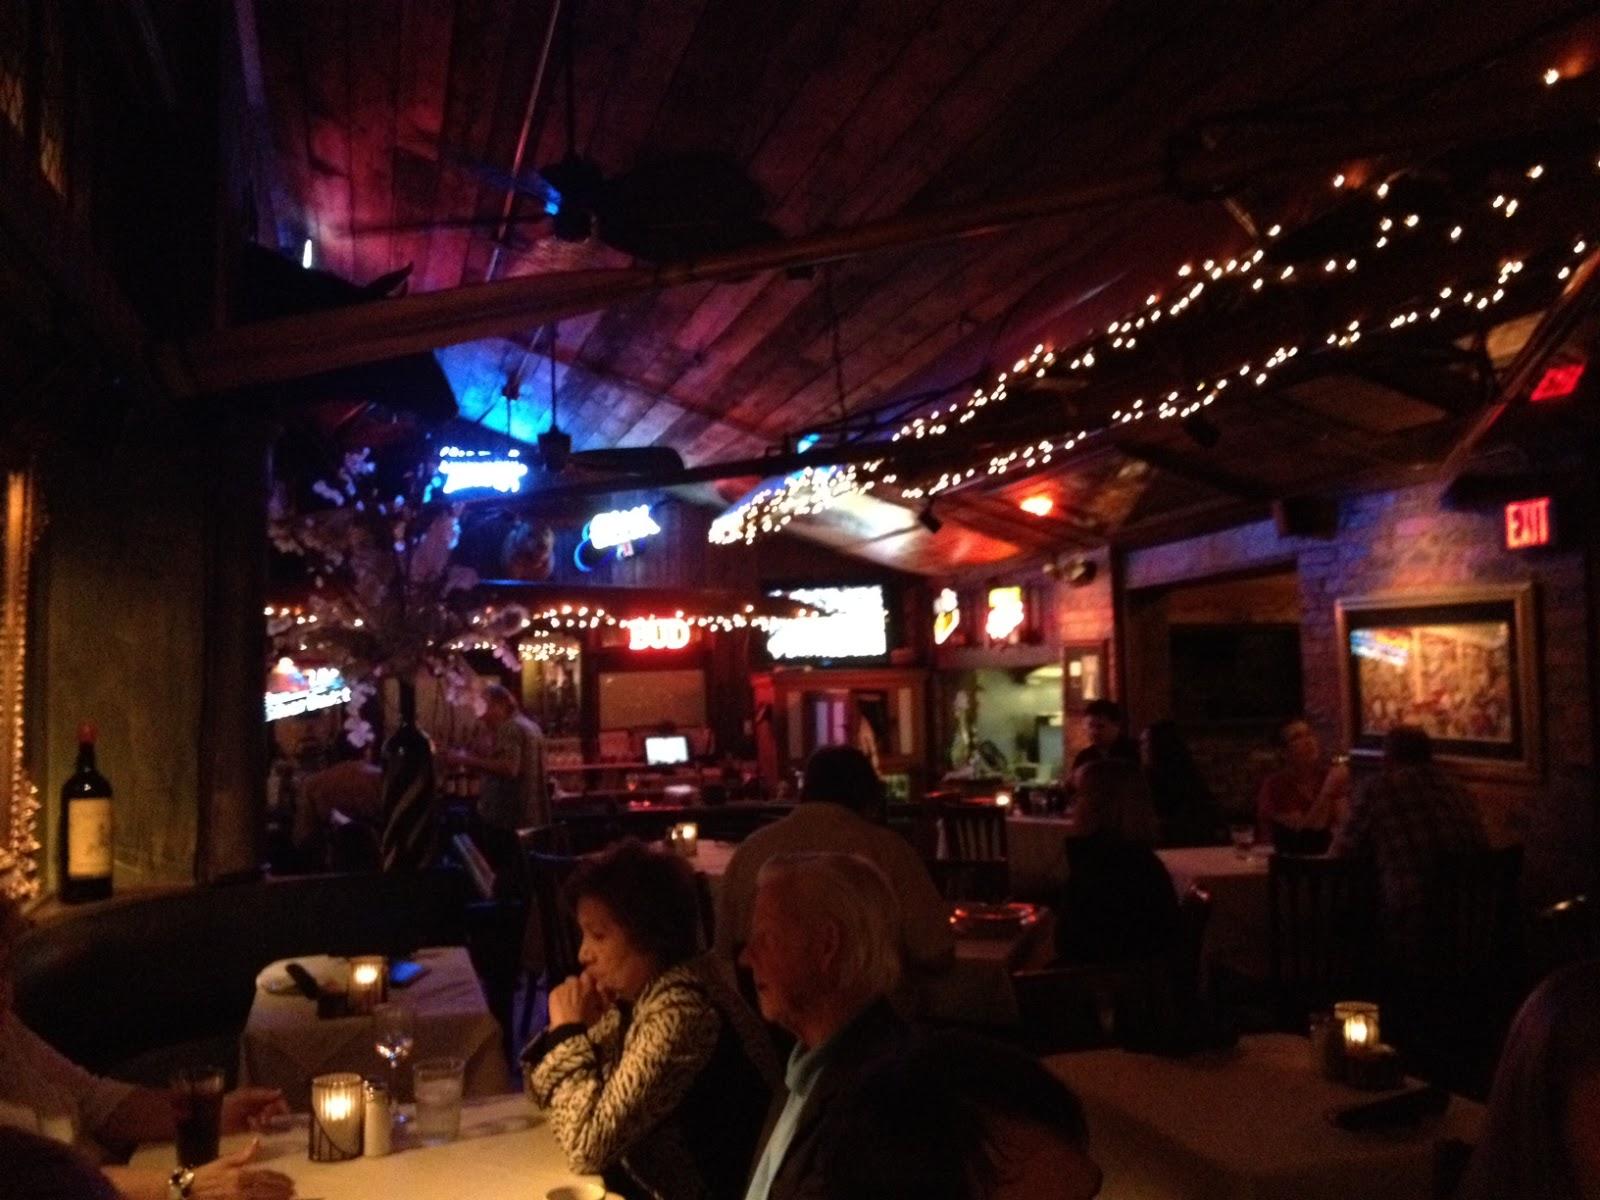 Culpepper S Restaurant In Texas